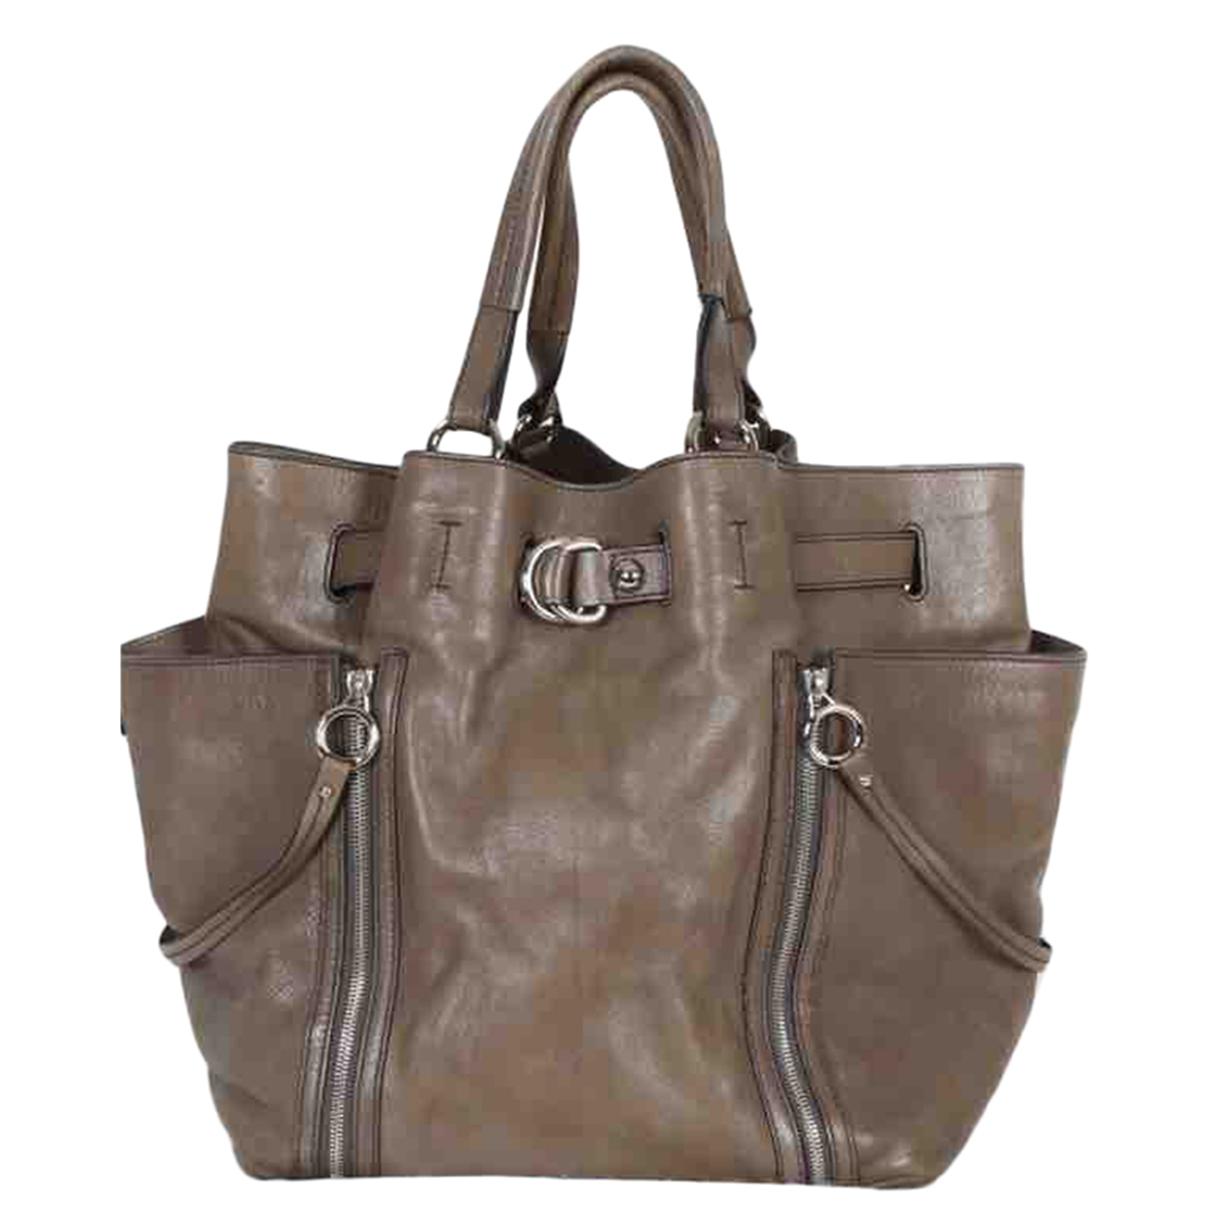 Dolce & Gabbana \N Grey Leather handbag for Women \N